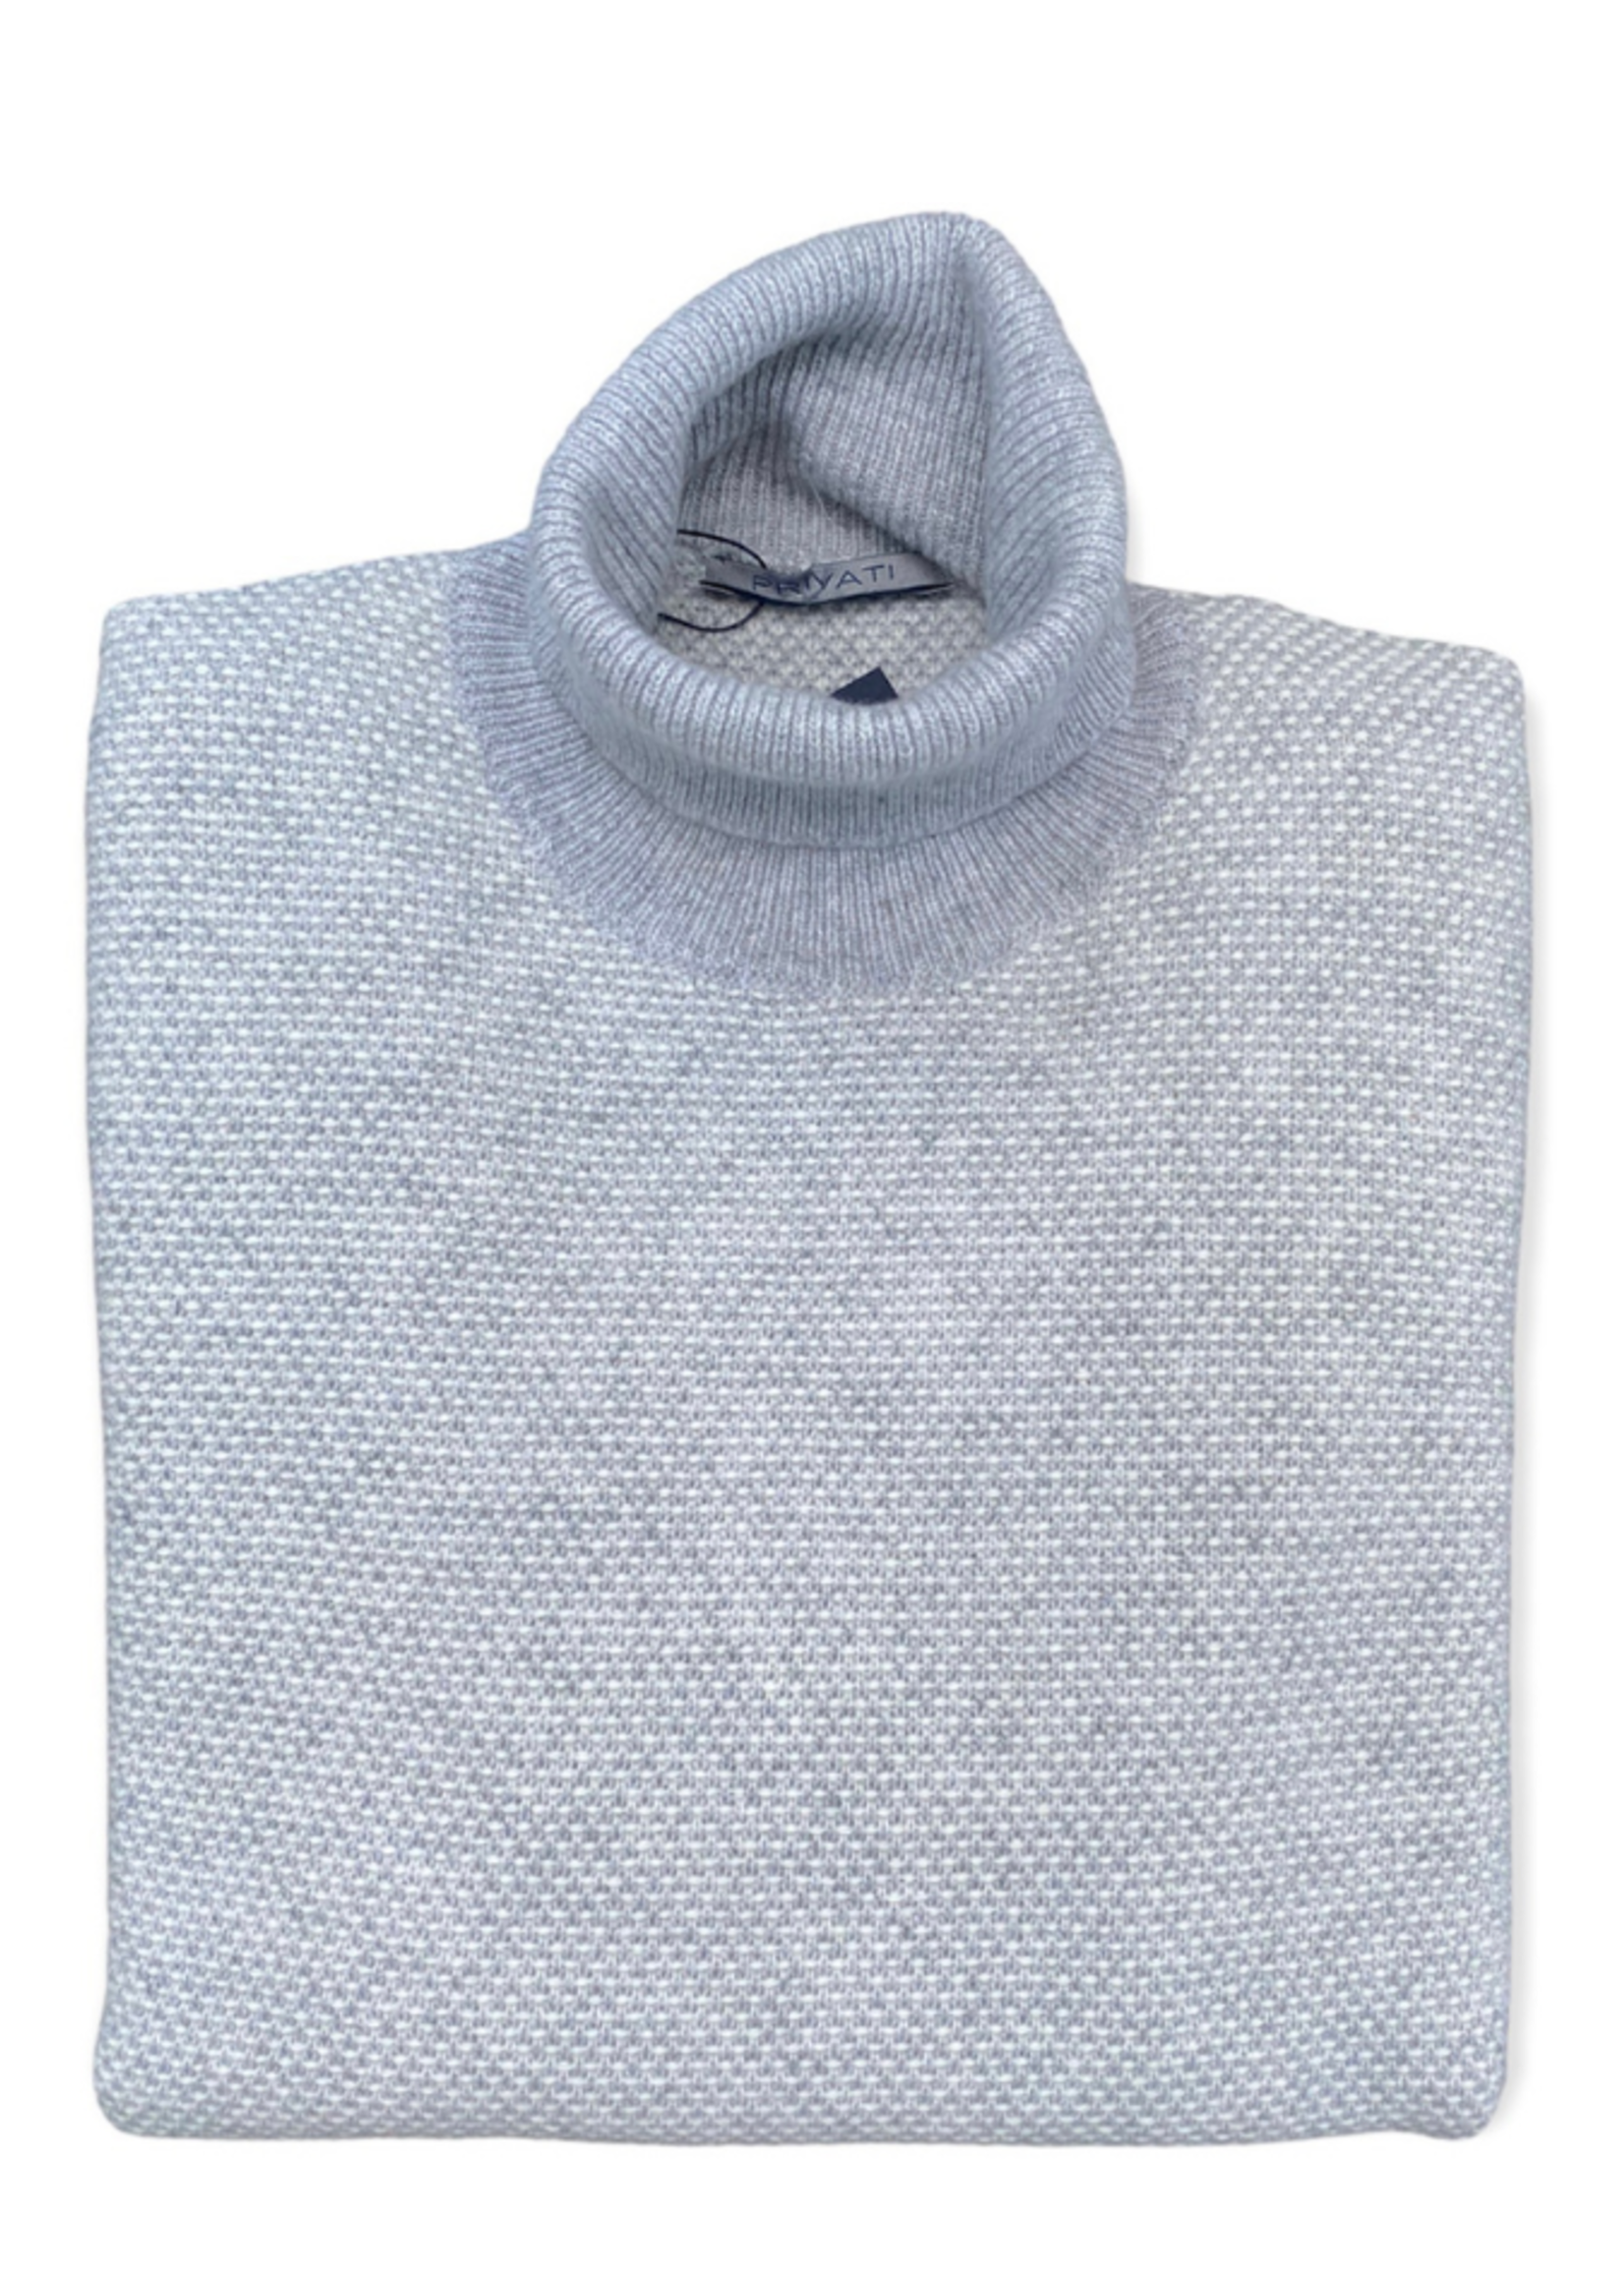 Privati Firenze Rollneck Knit Stitch